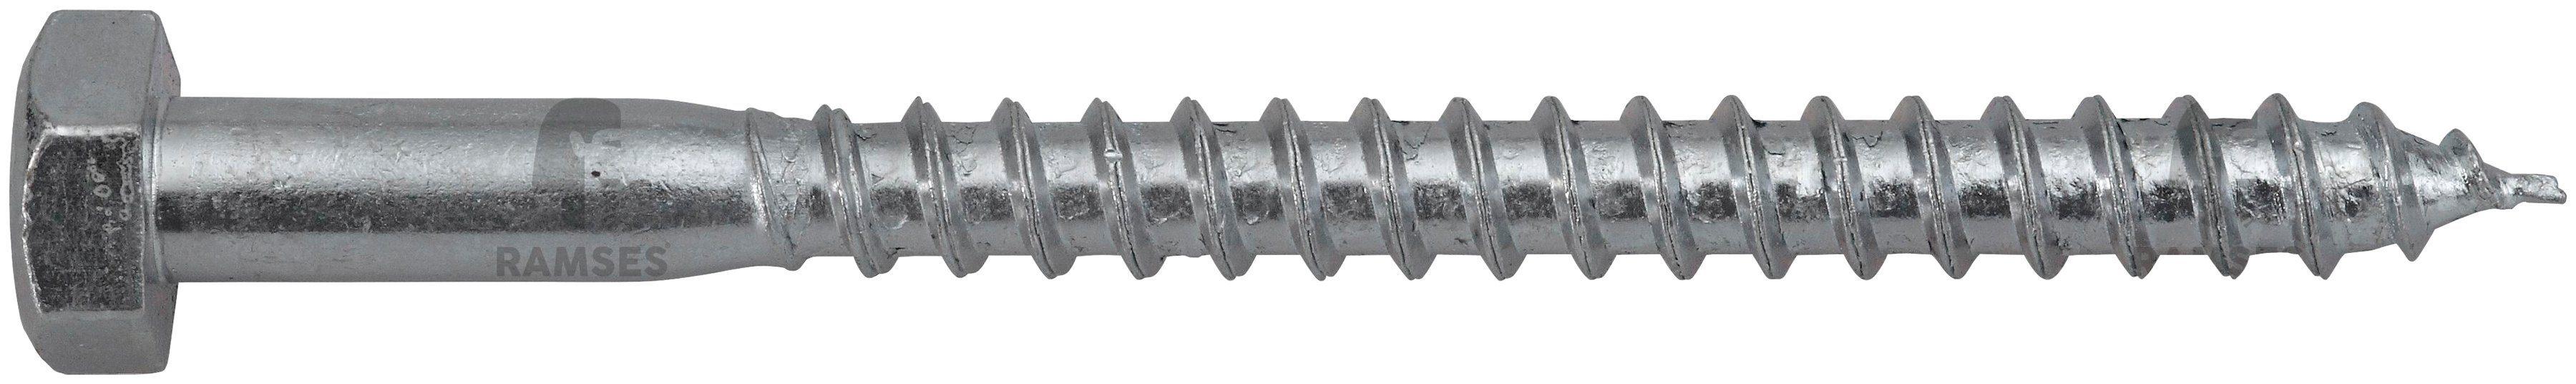 RAMSES Schrauben , Sechskant-Holzschraube 10 x 300 mm 25 Stk.